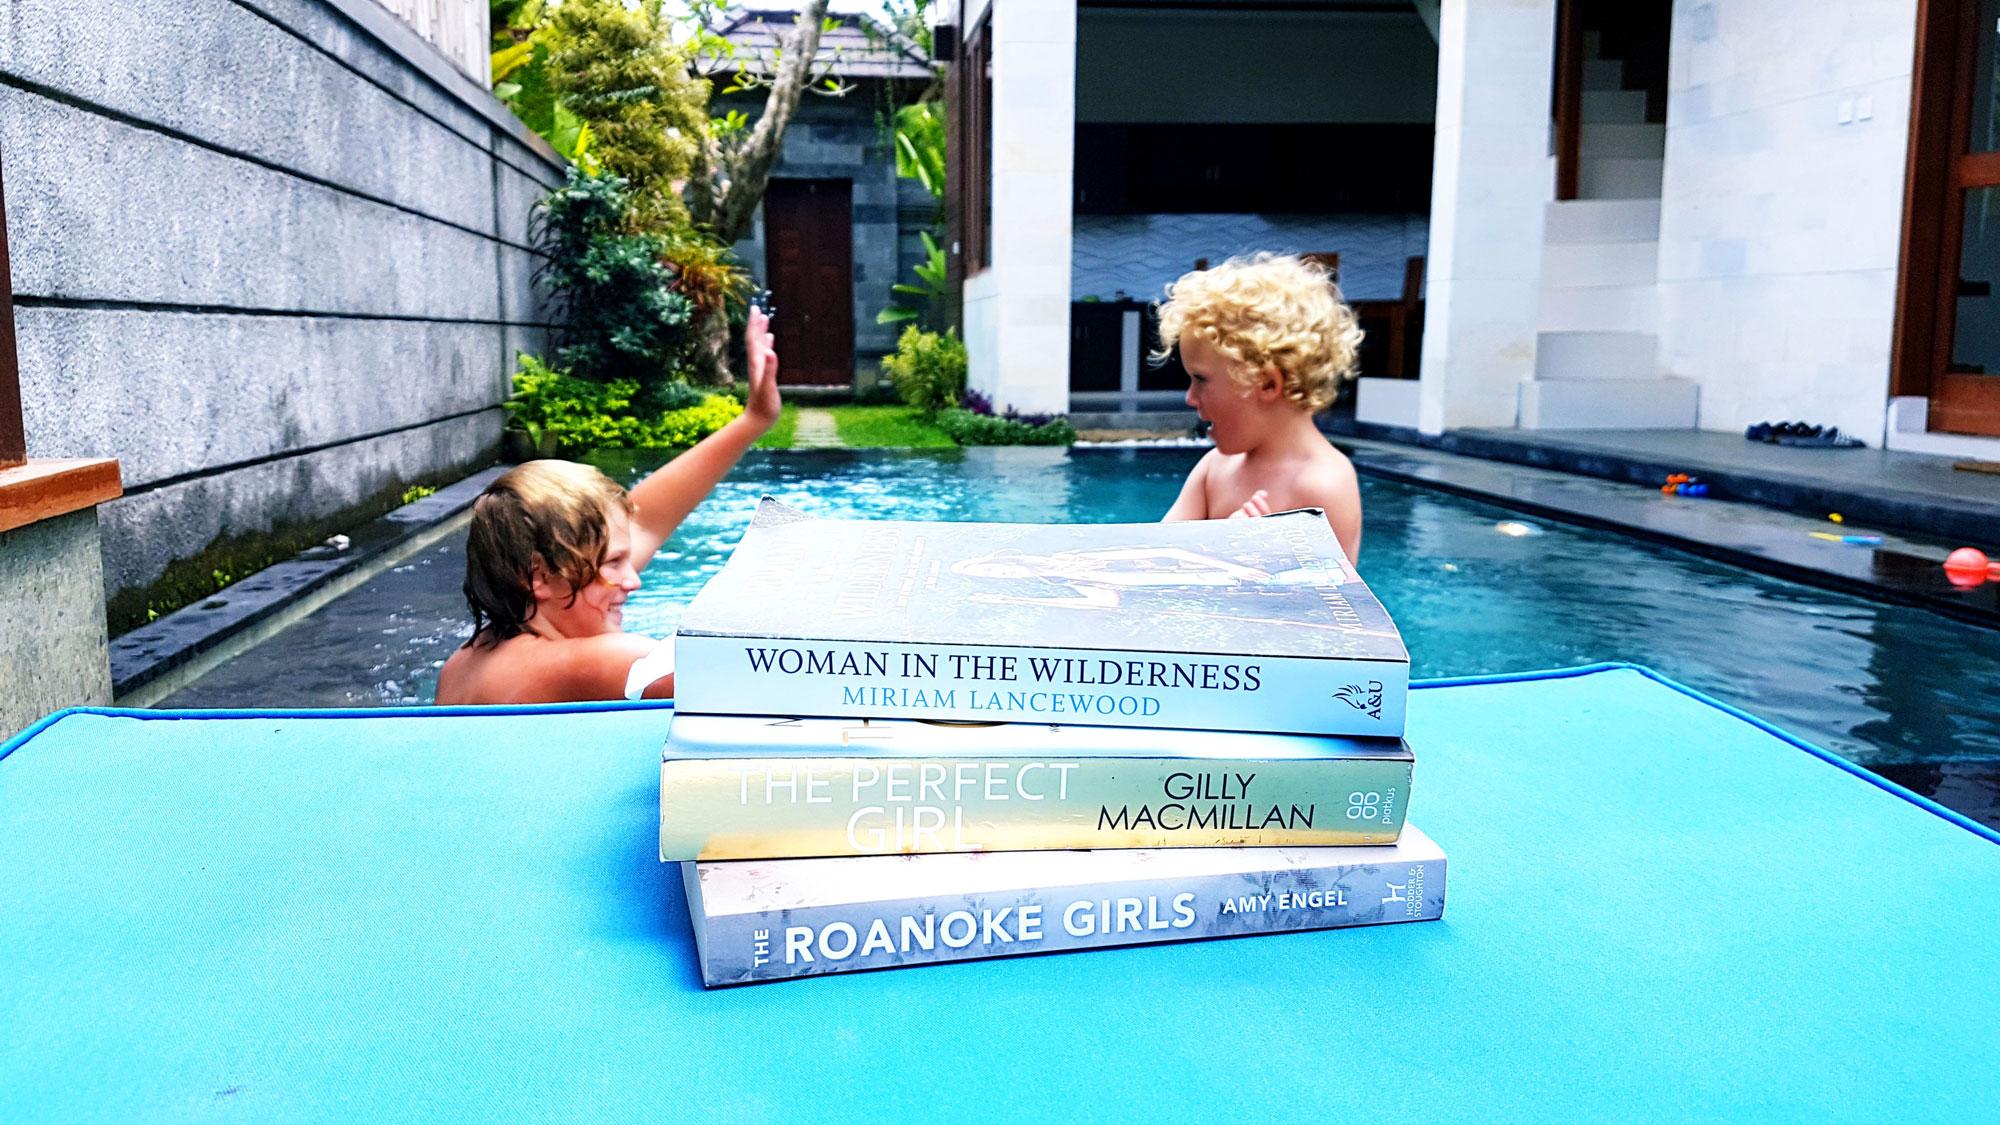 Book Reviews: My Bali Book List